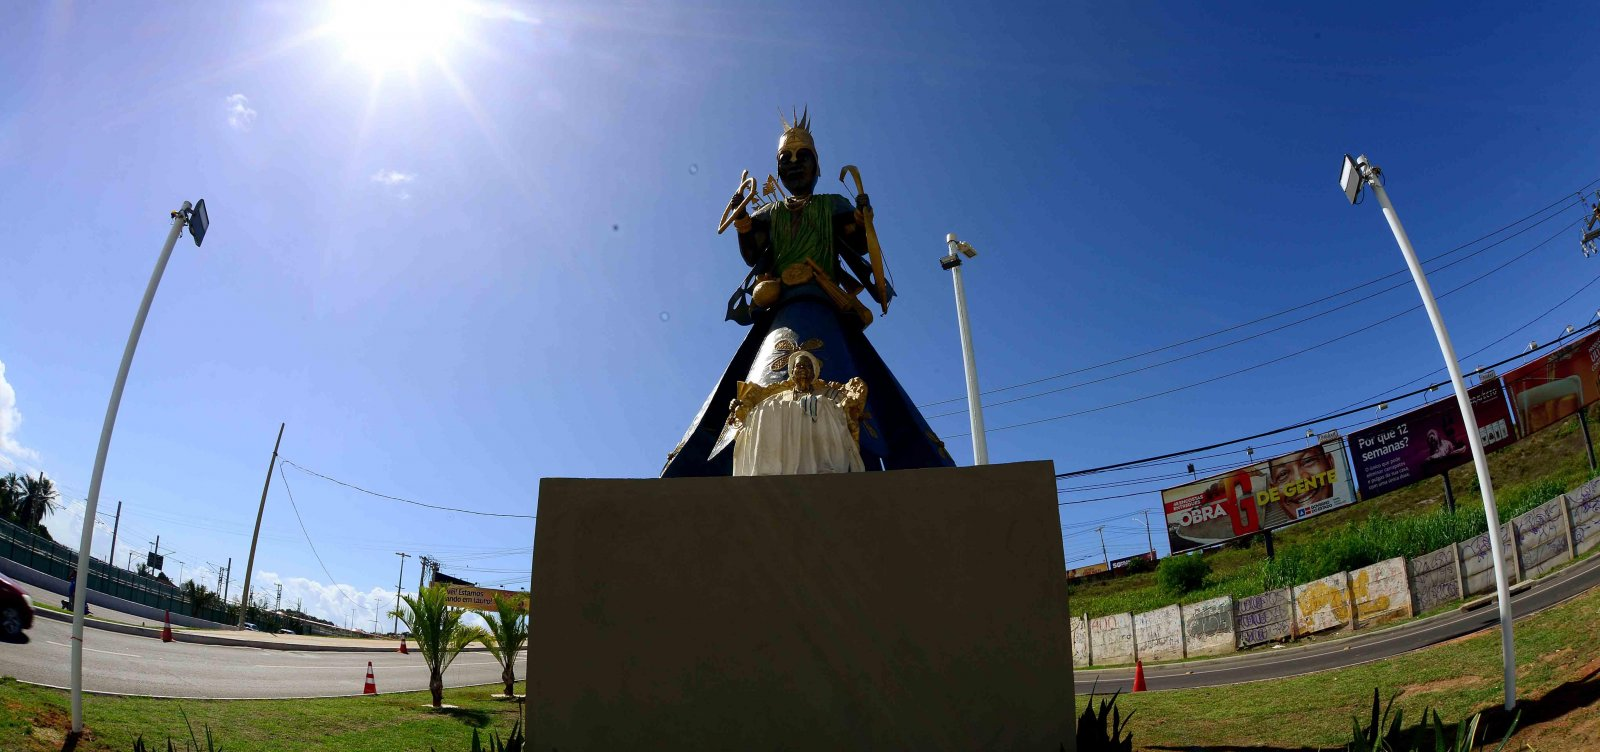 Homem posta vídeo criticando escultura de Mãe Stella; MP apura intolerância